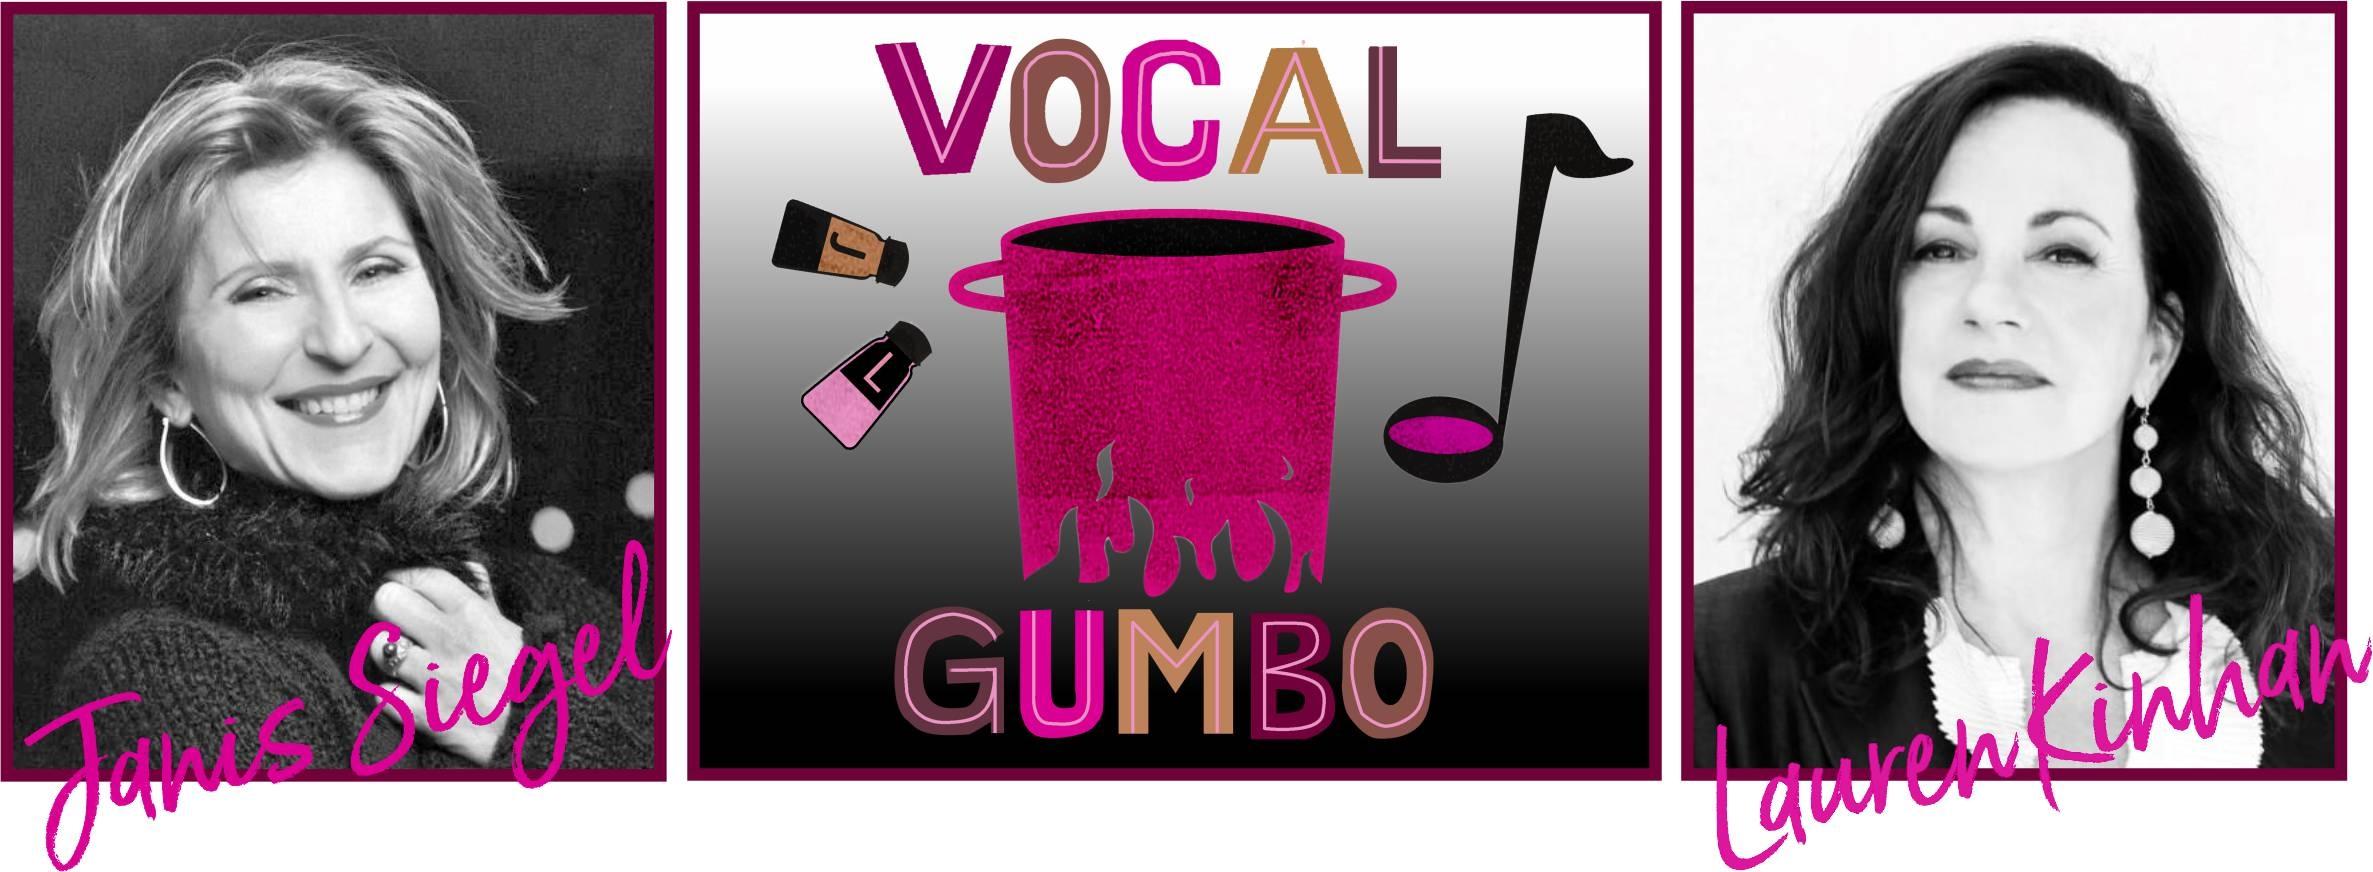 Vocal Gumbo